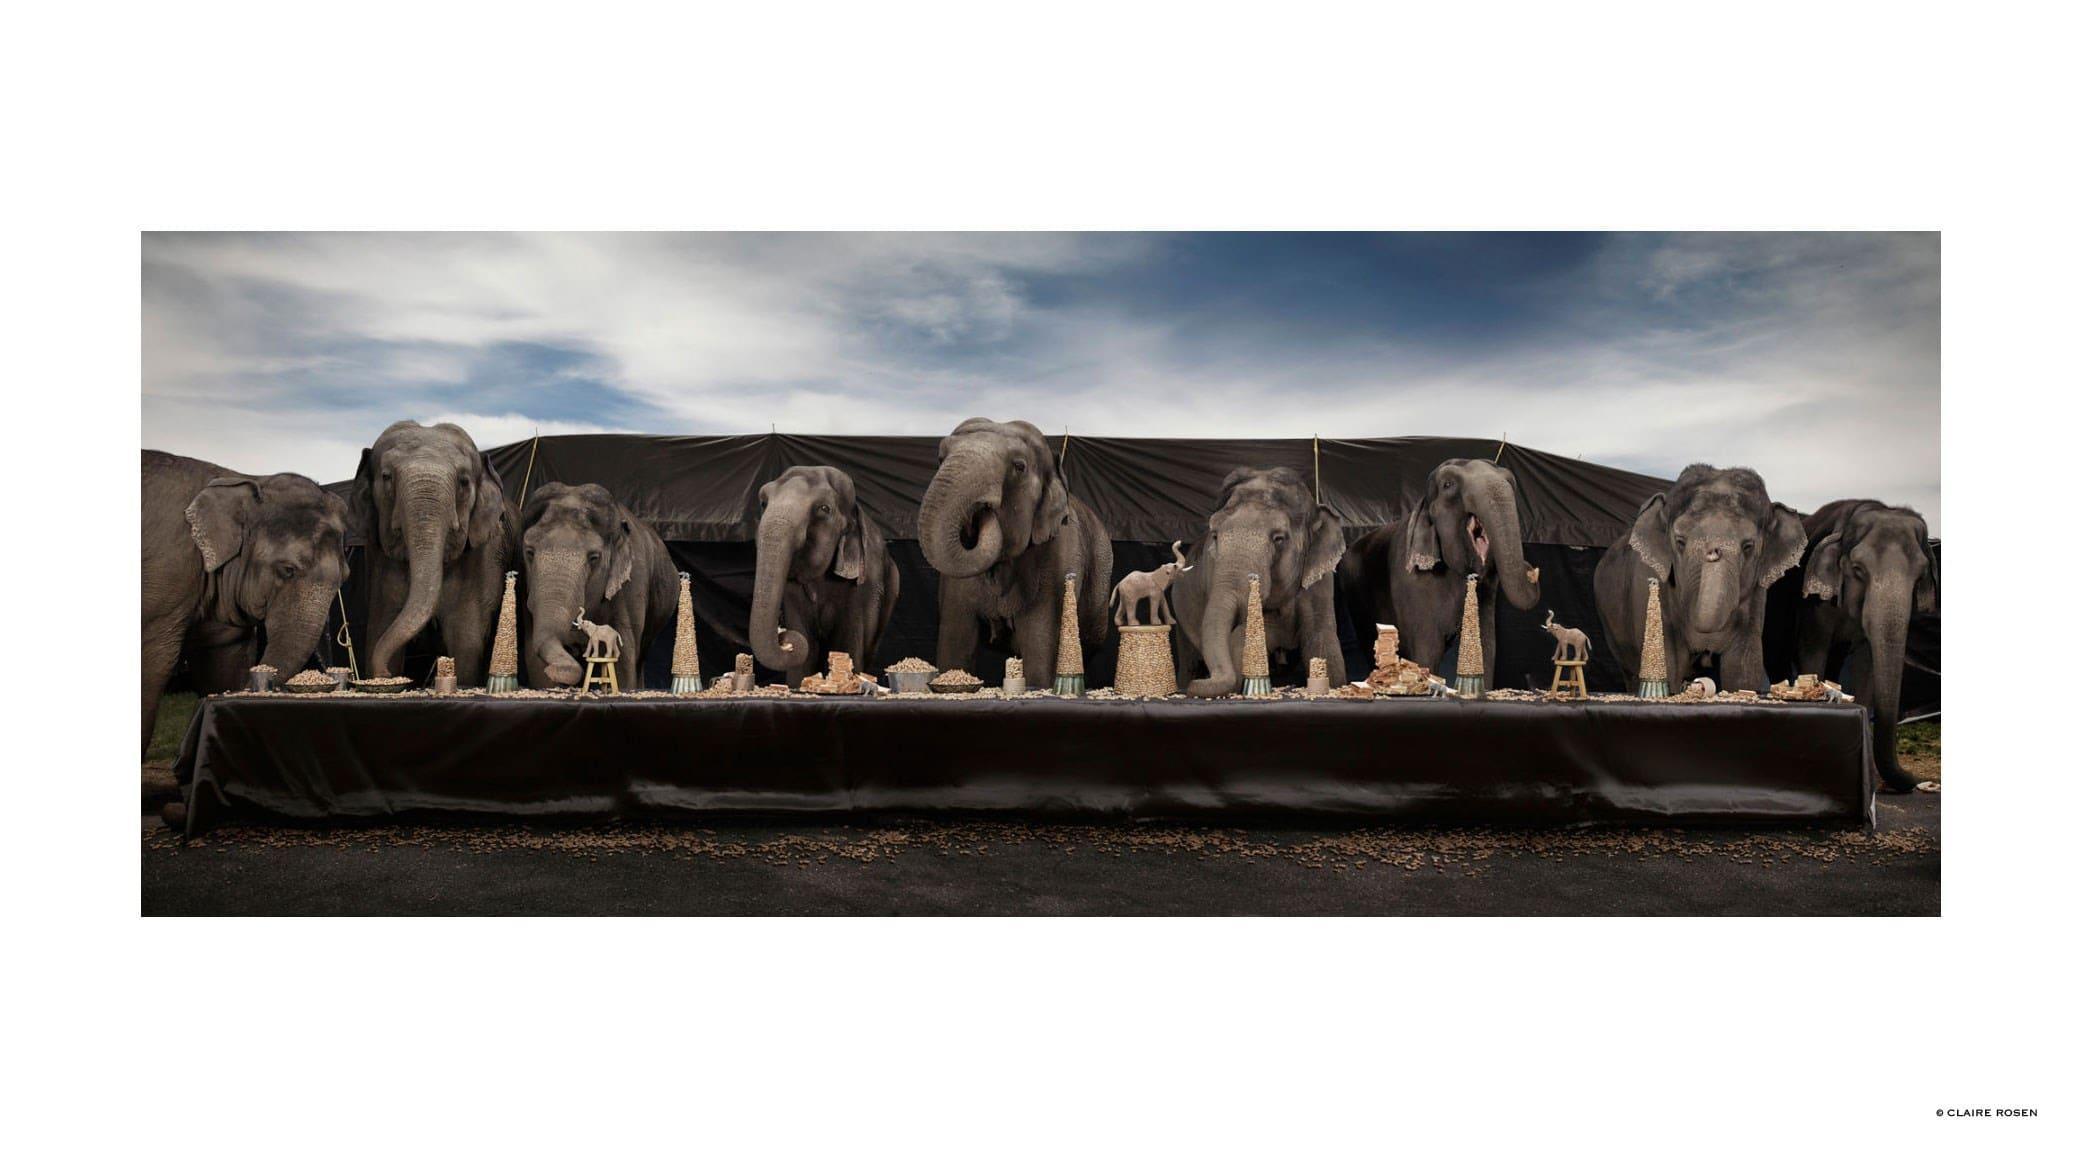 original_elephants-claire-rosen-finedininglovers.jpg